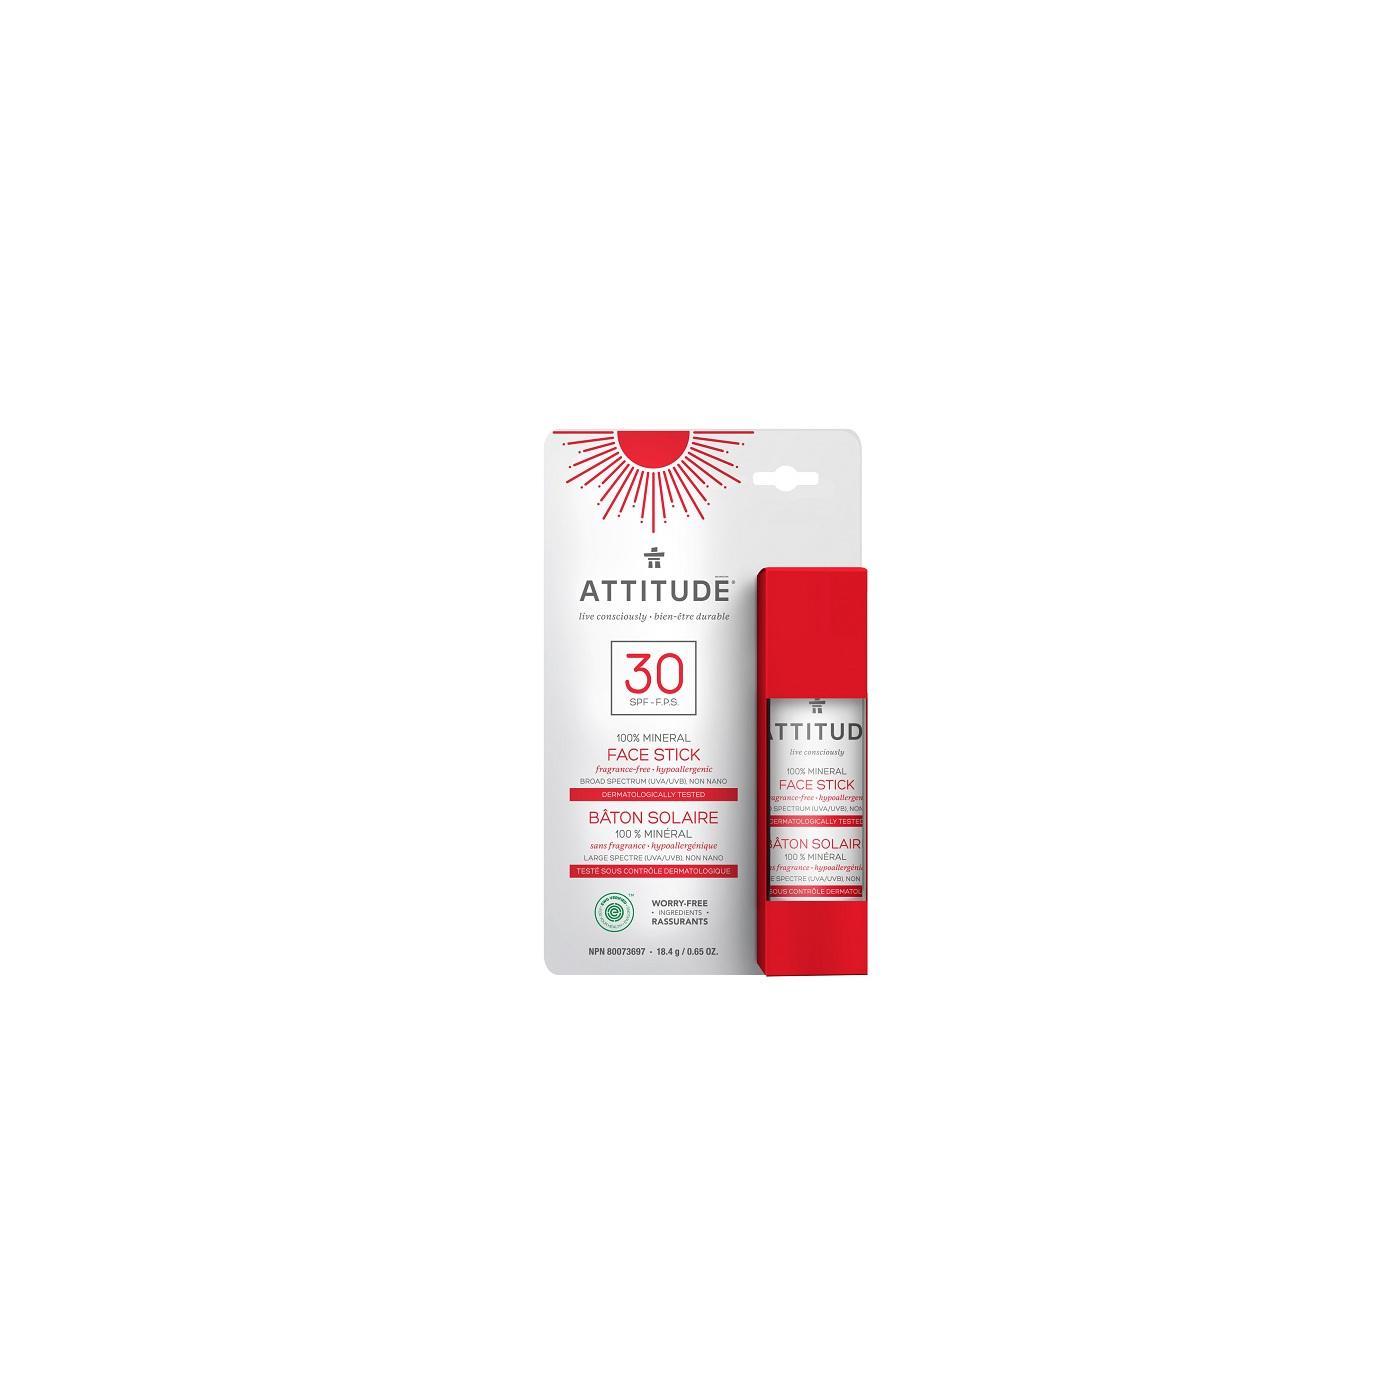 Attitude 100% minerální ochranná tyčinka SPF 30 na obličej a rty 18,4 g